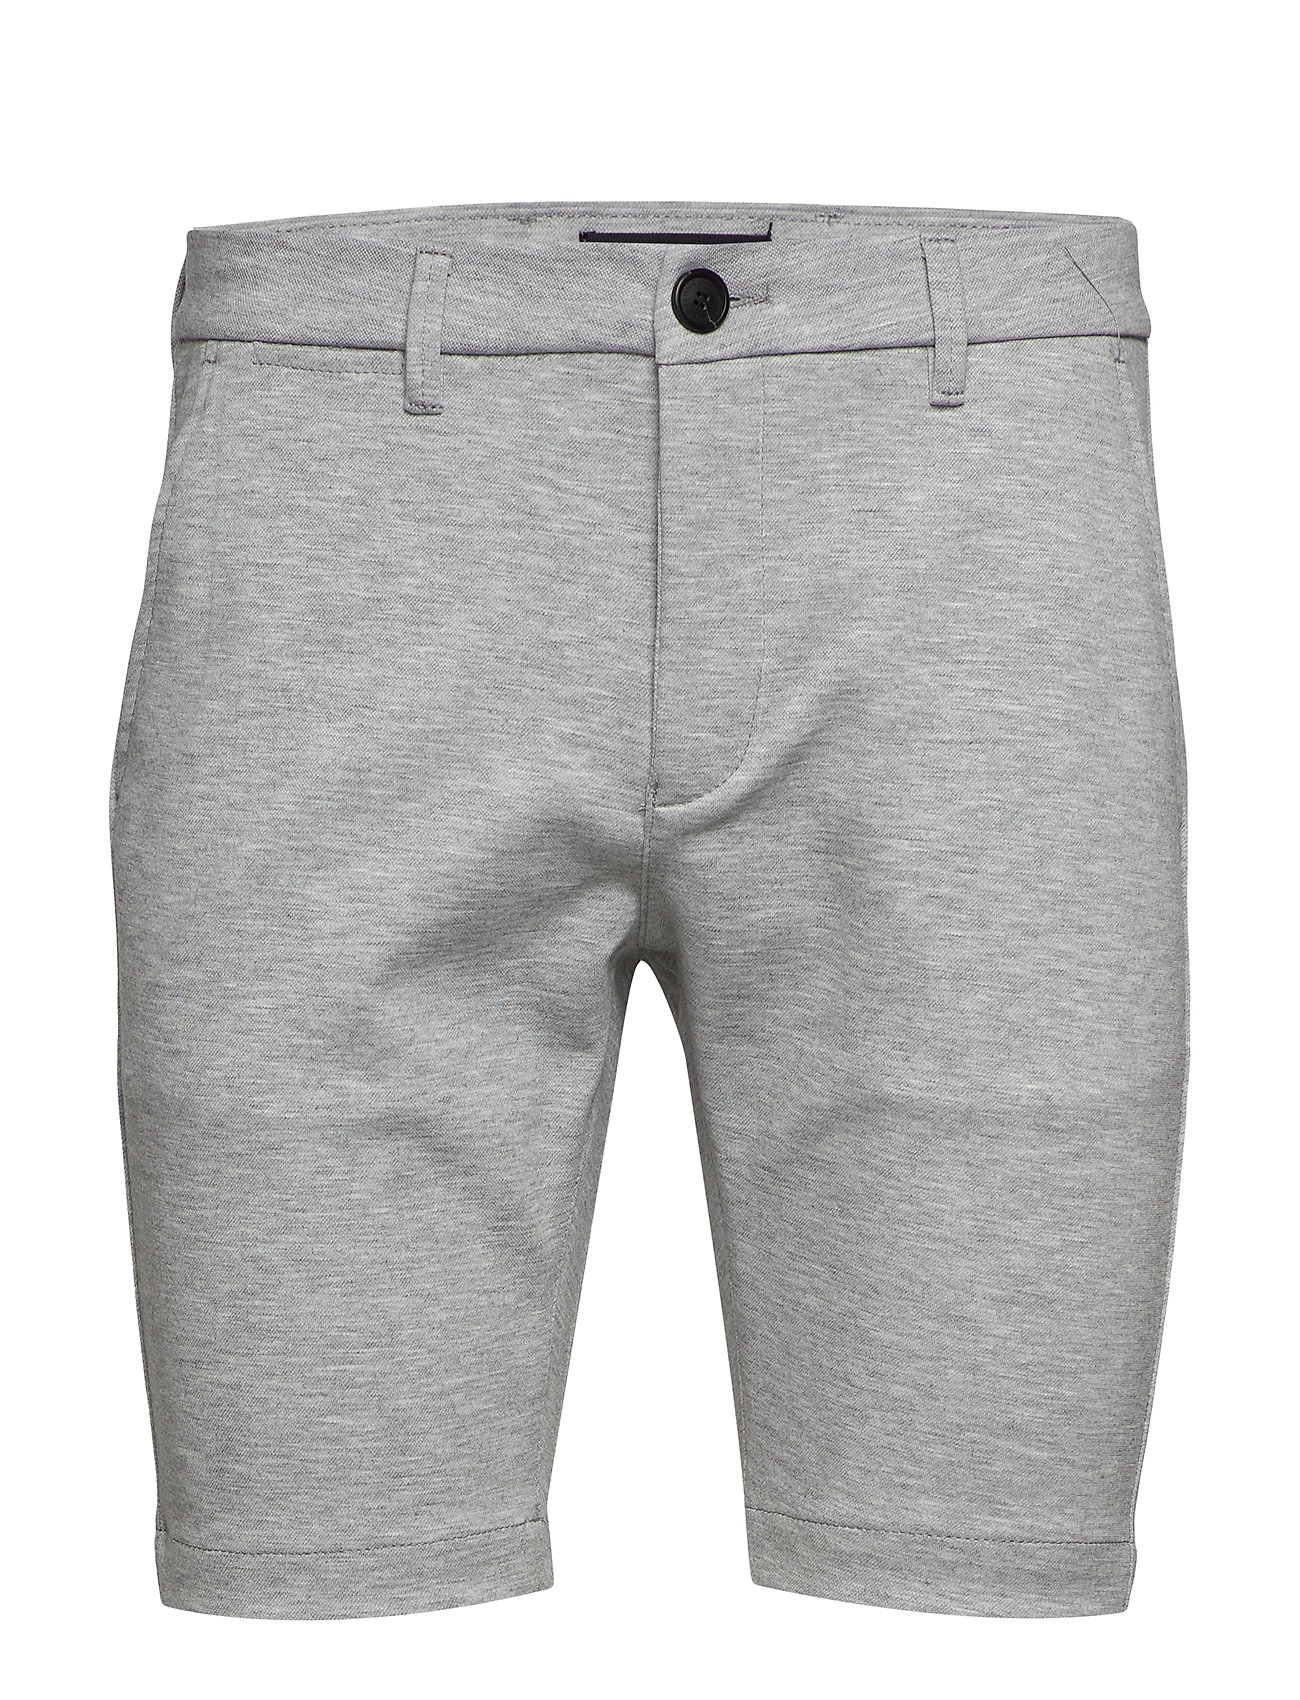 Image of Jason Chino Jersey Shorts Shorts Casual Grå Gabba (3562603839)